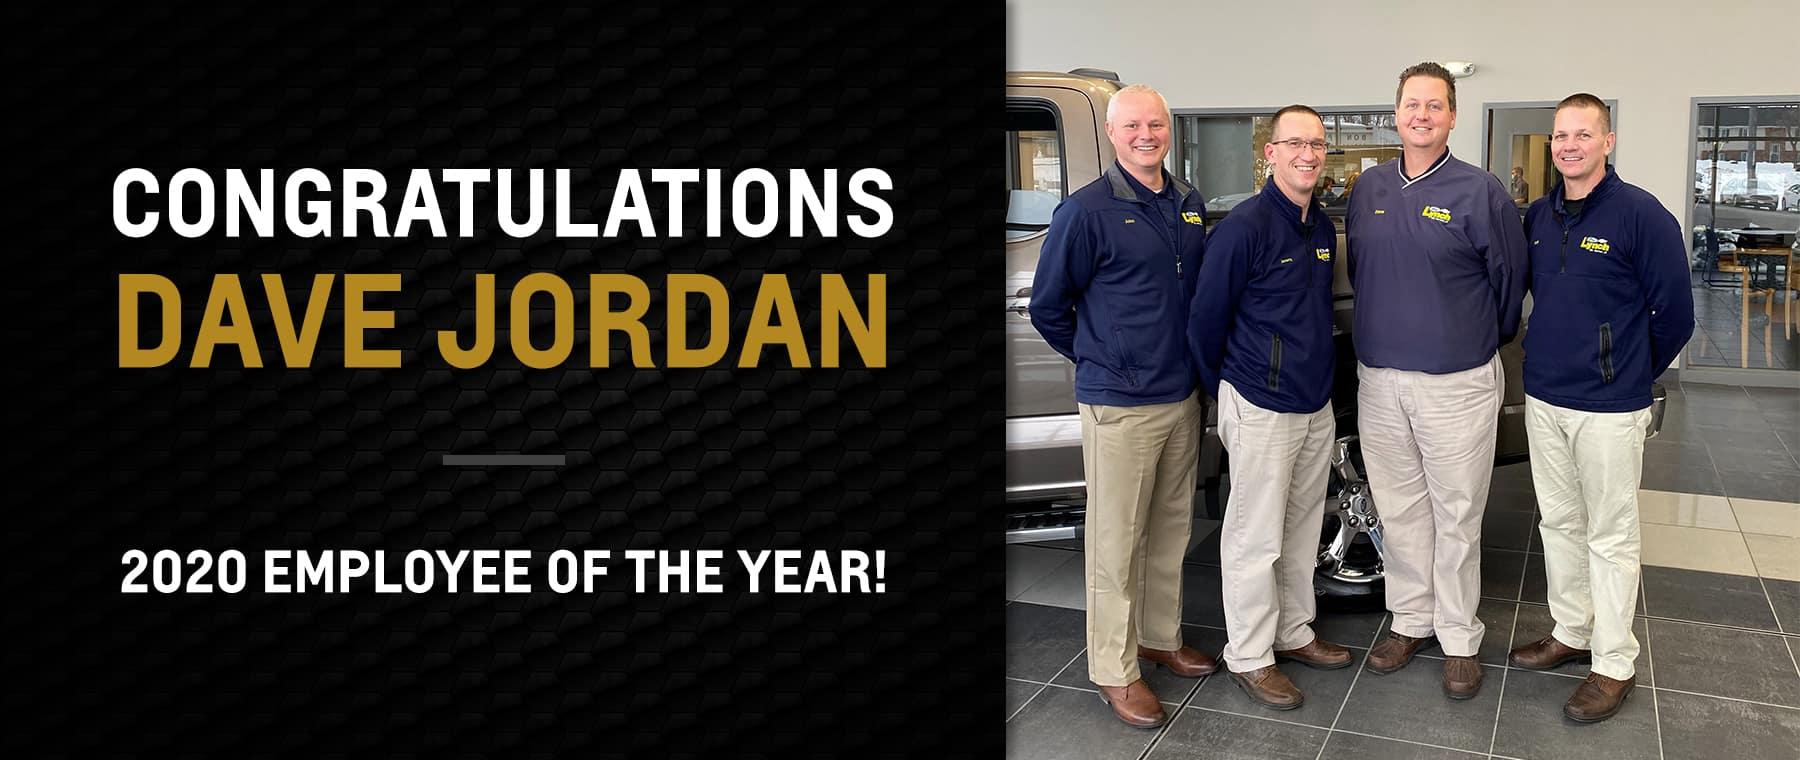 Congratulations Dave Jordan